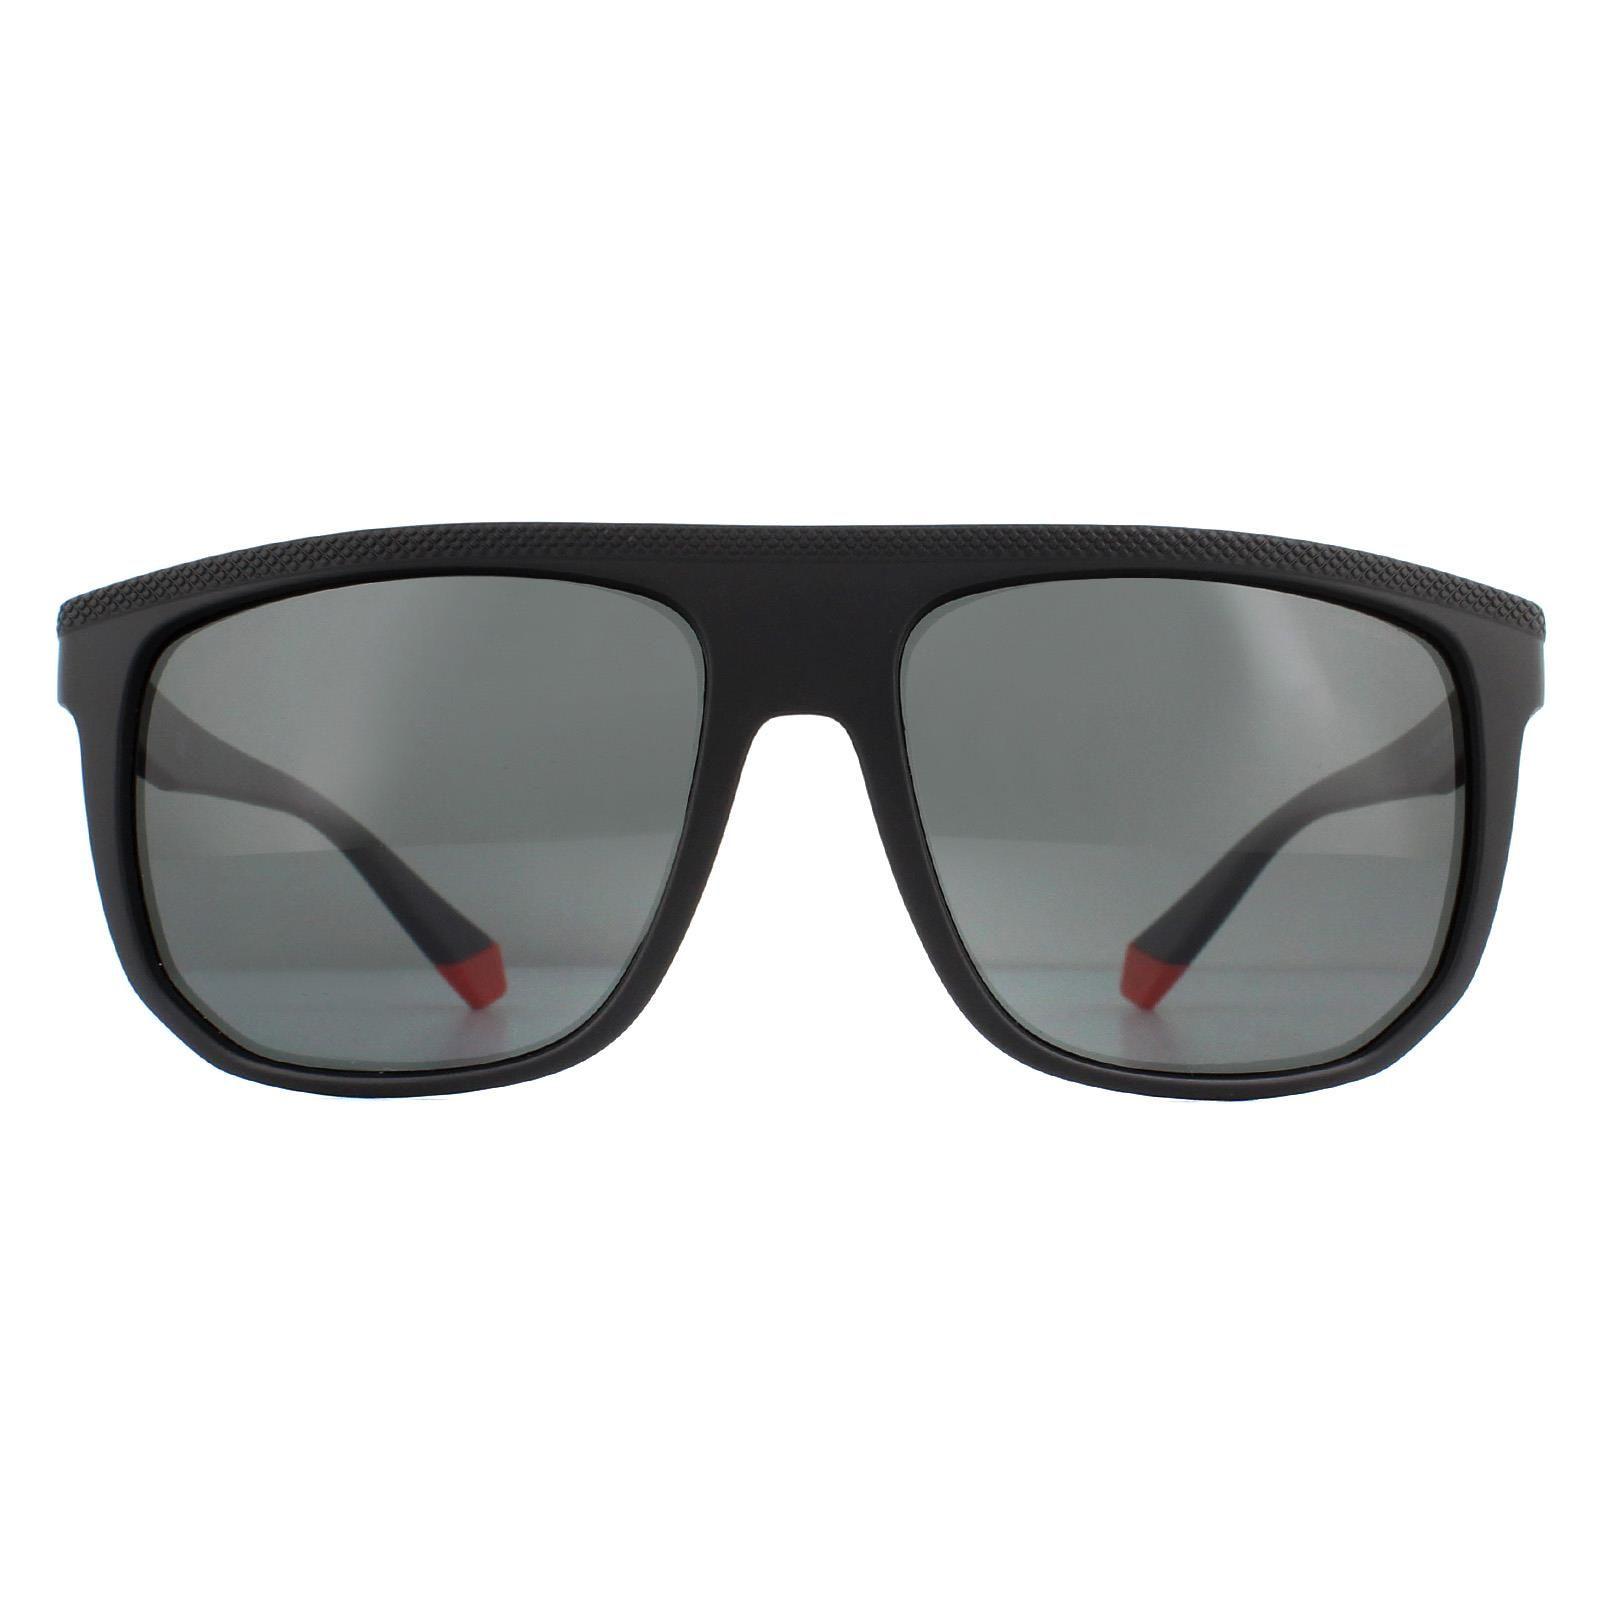 Polaroid Sunglasses PLD 7033/S 807 M9 Black Grey Polarized